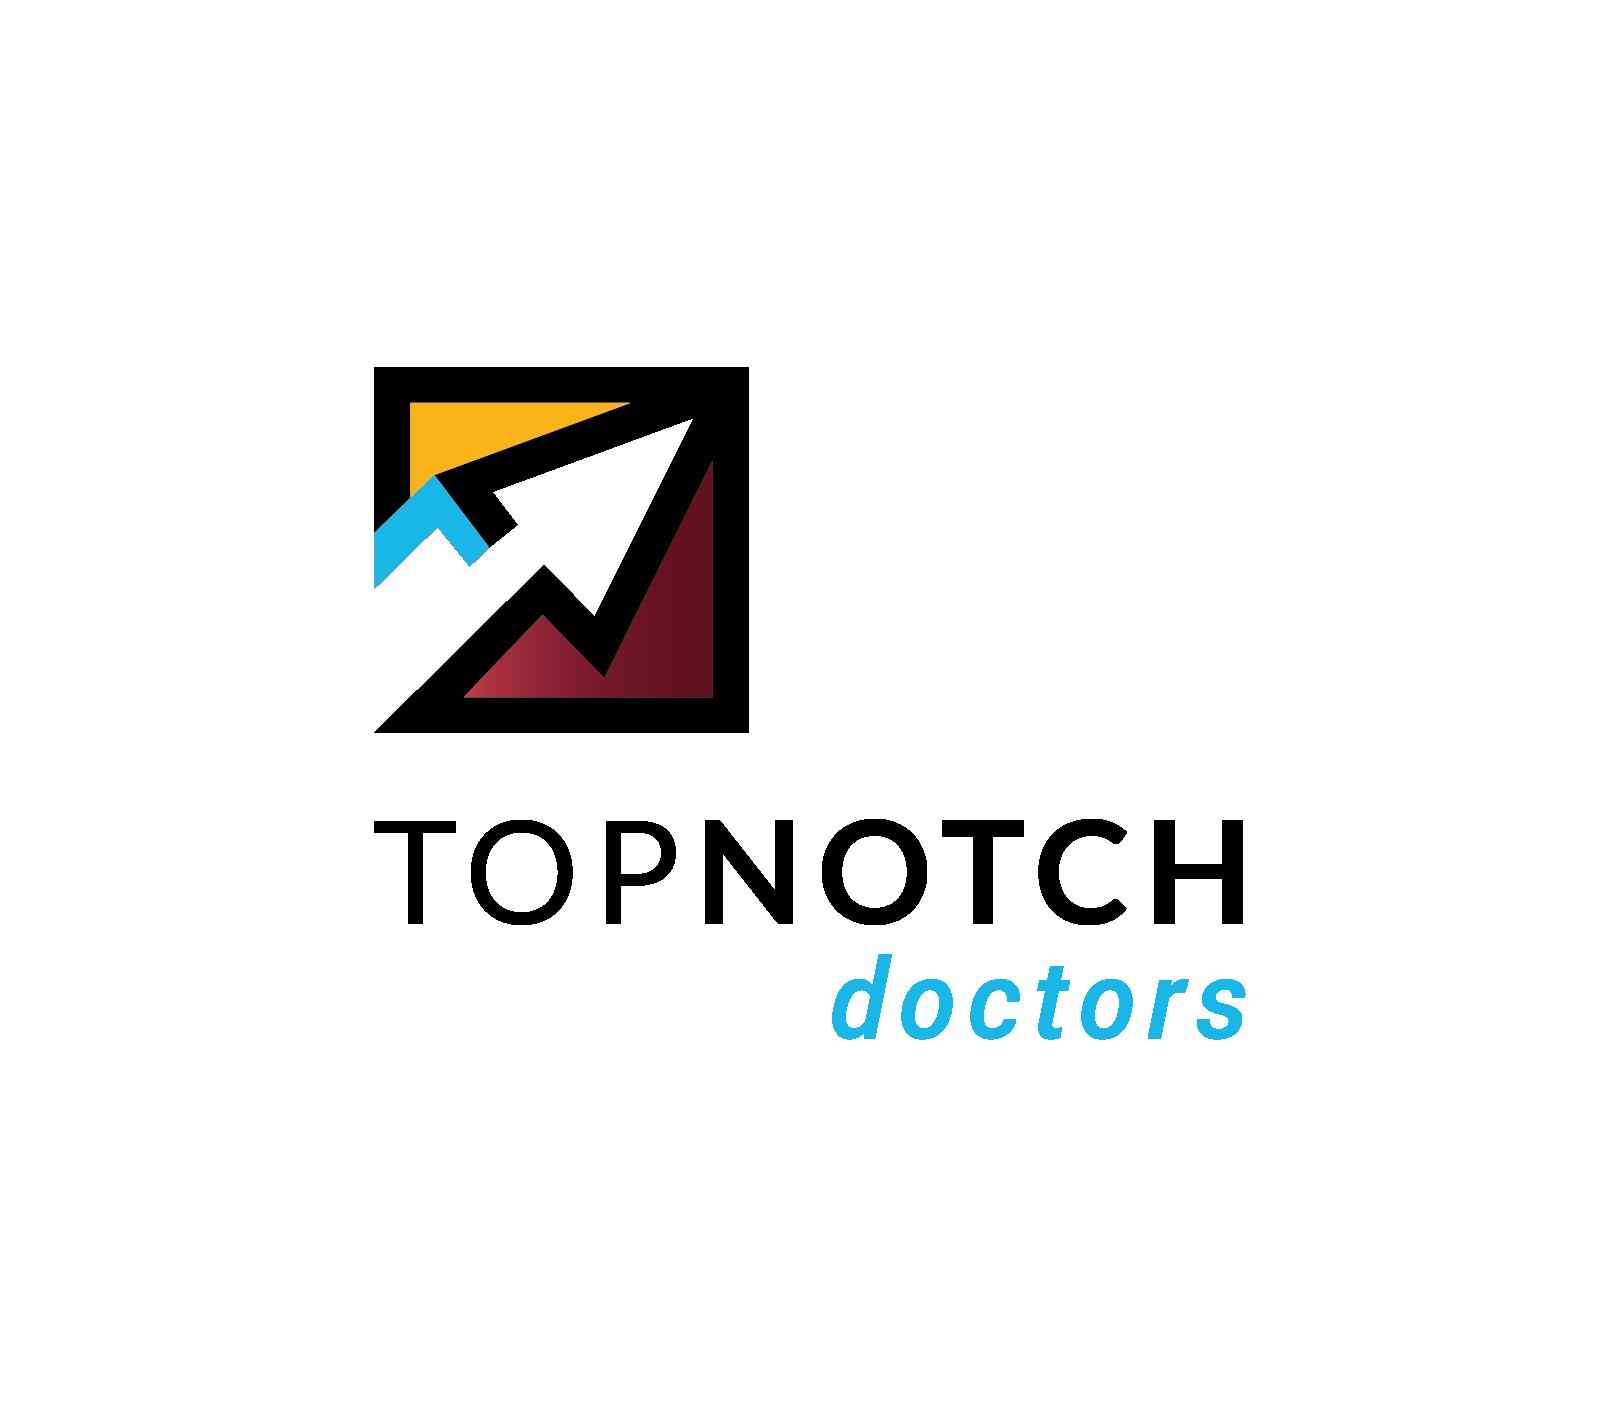 Top Notch Doctors